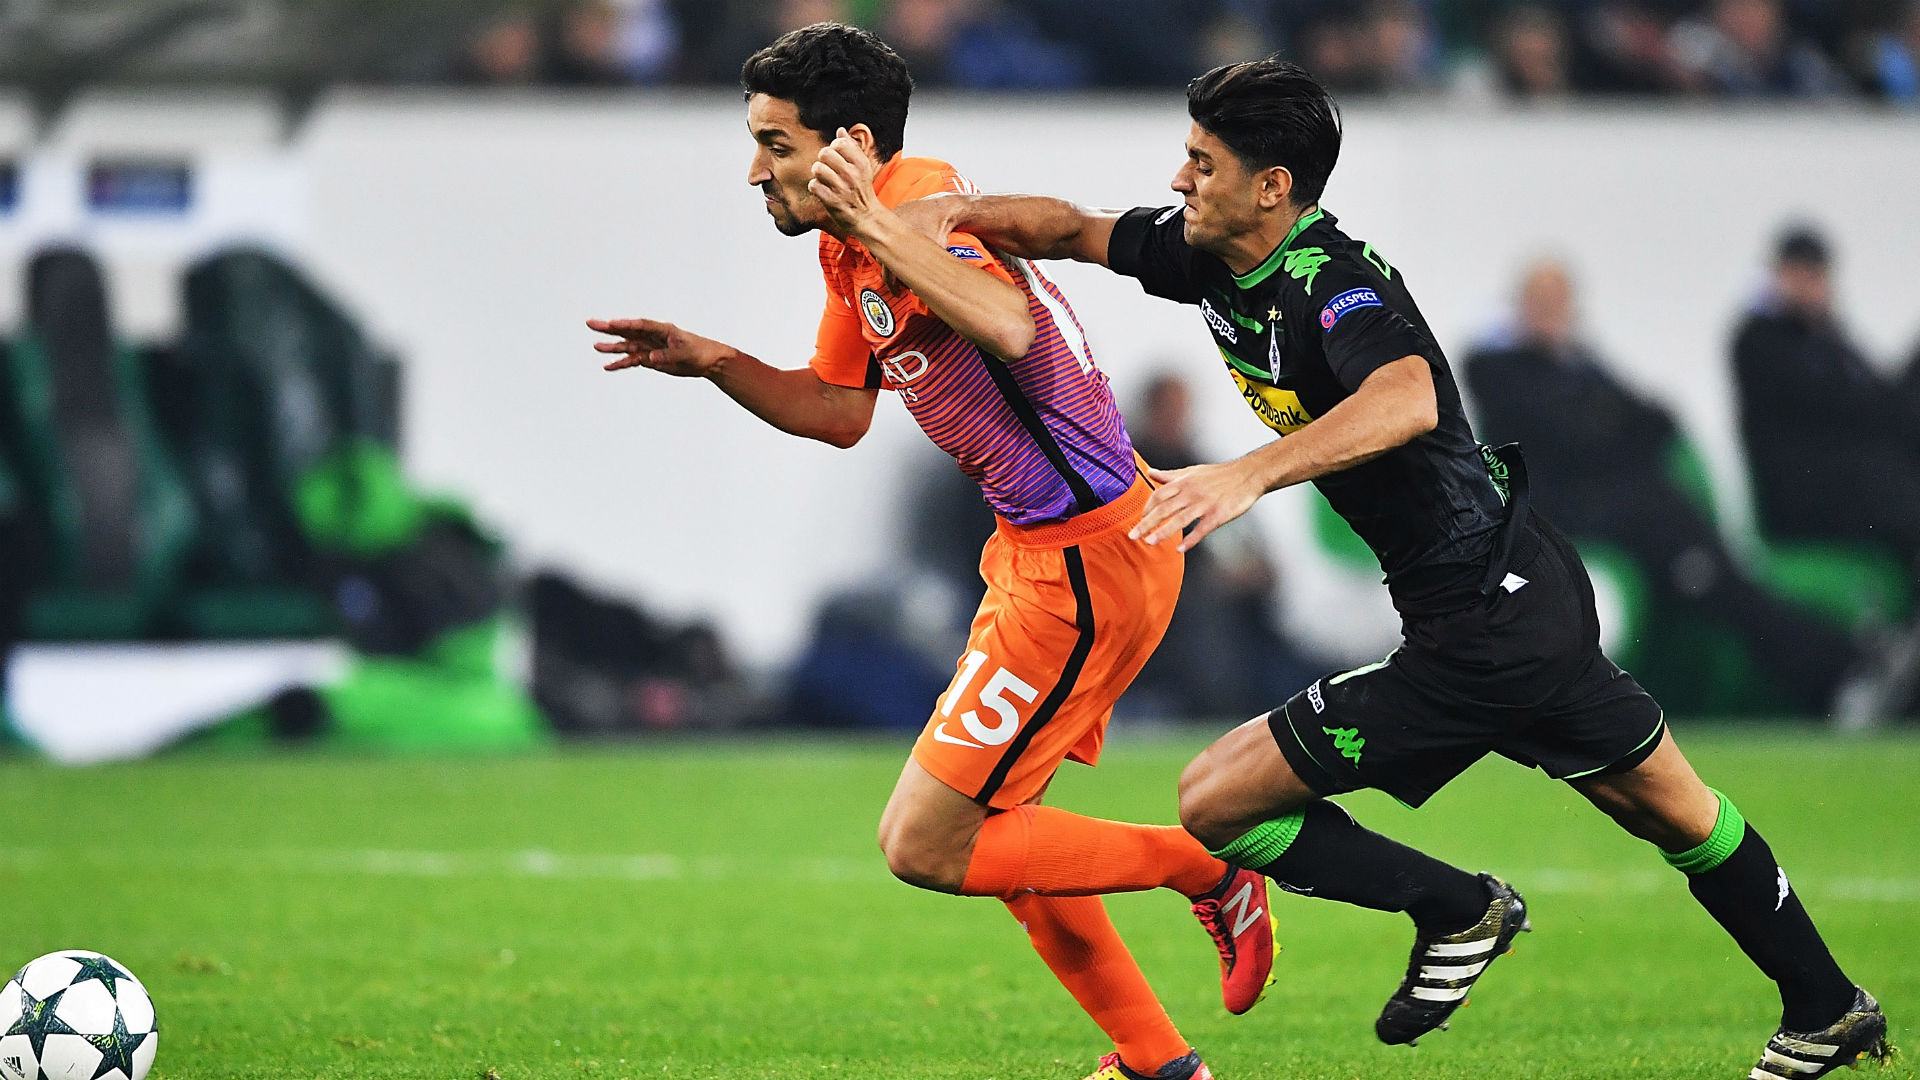 Kompany out for 4-6 weeks, says Guardiola